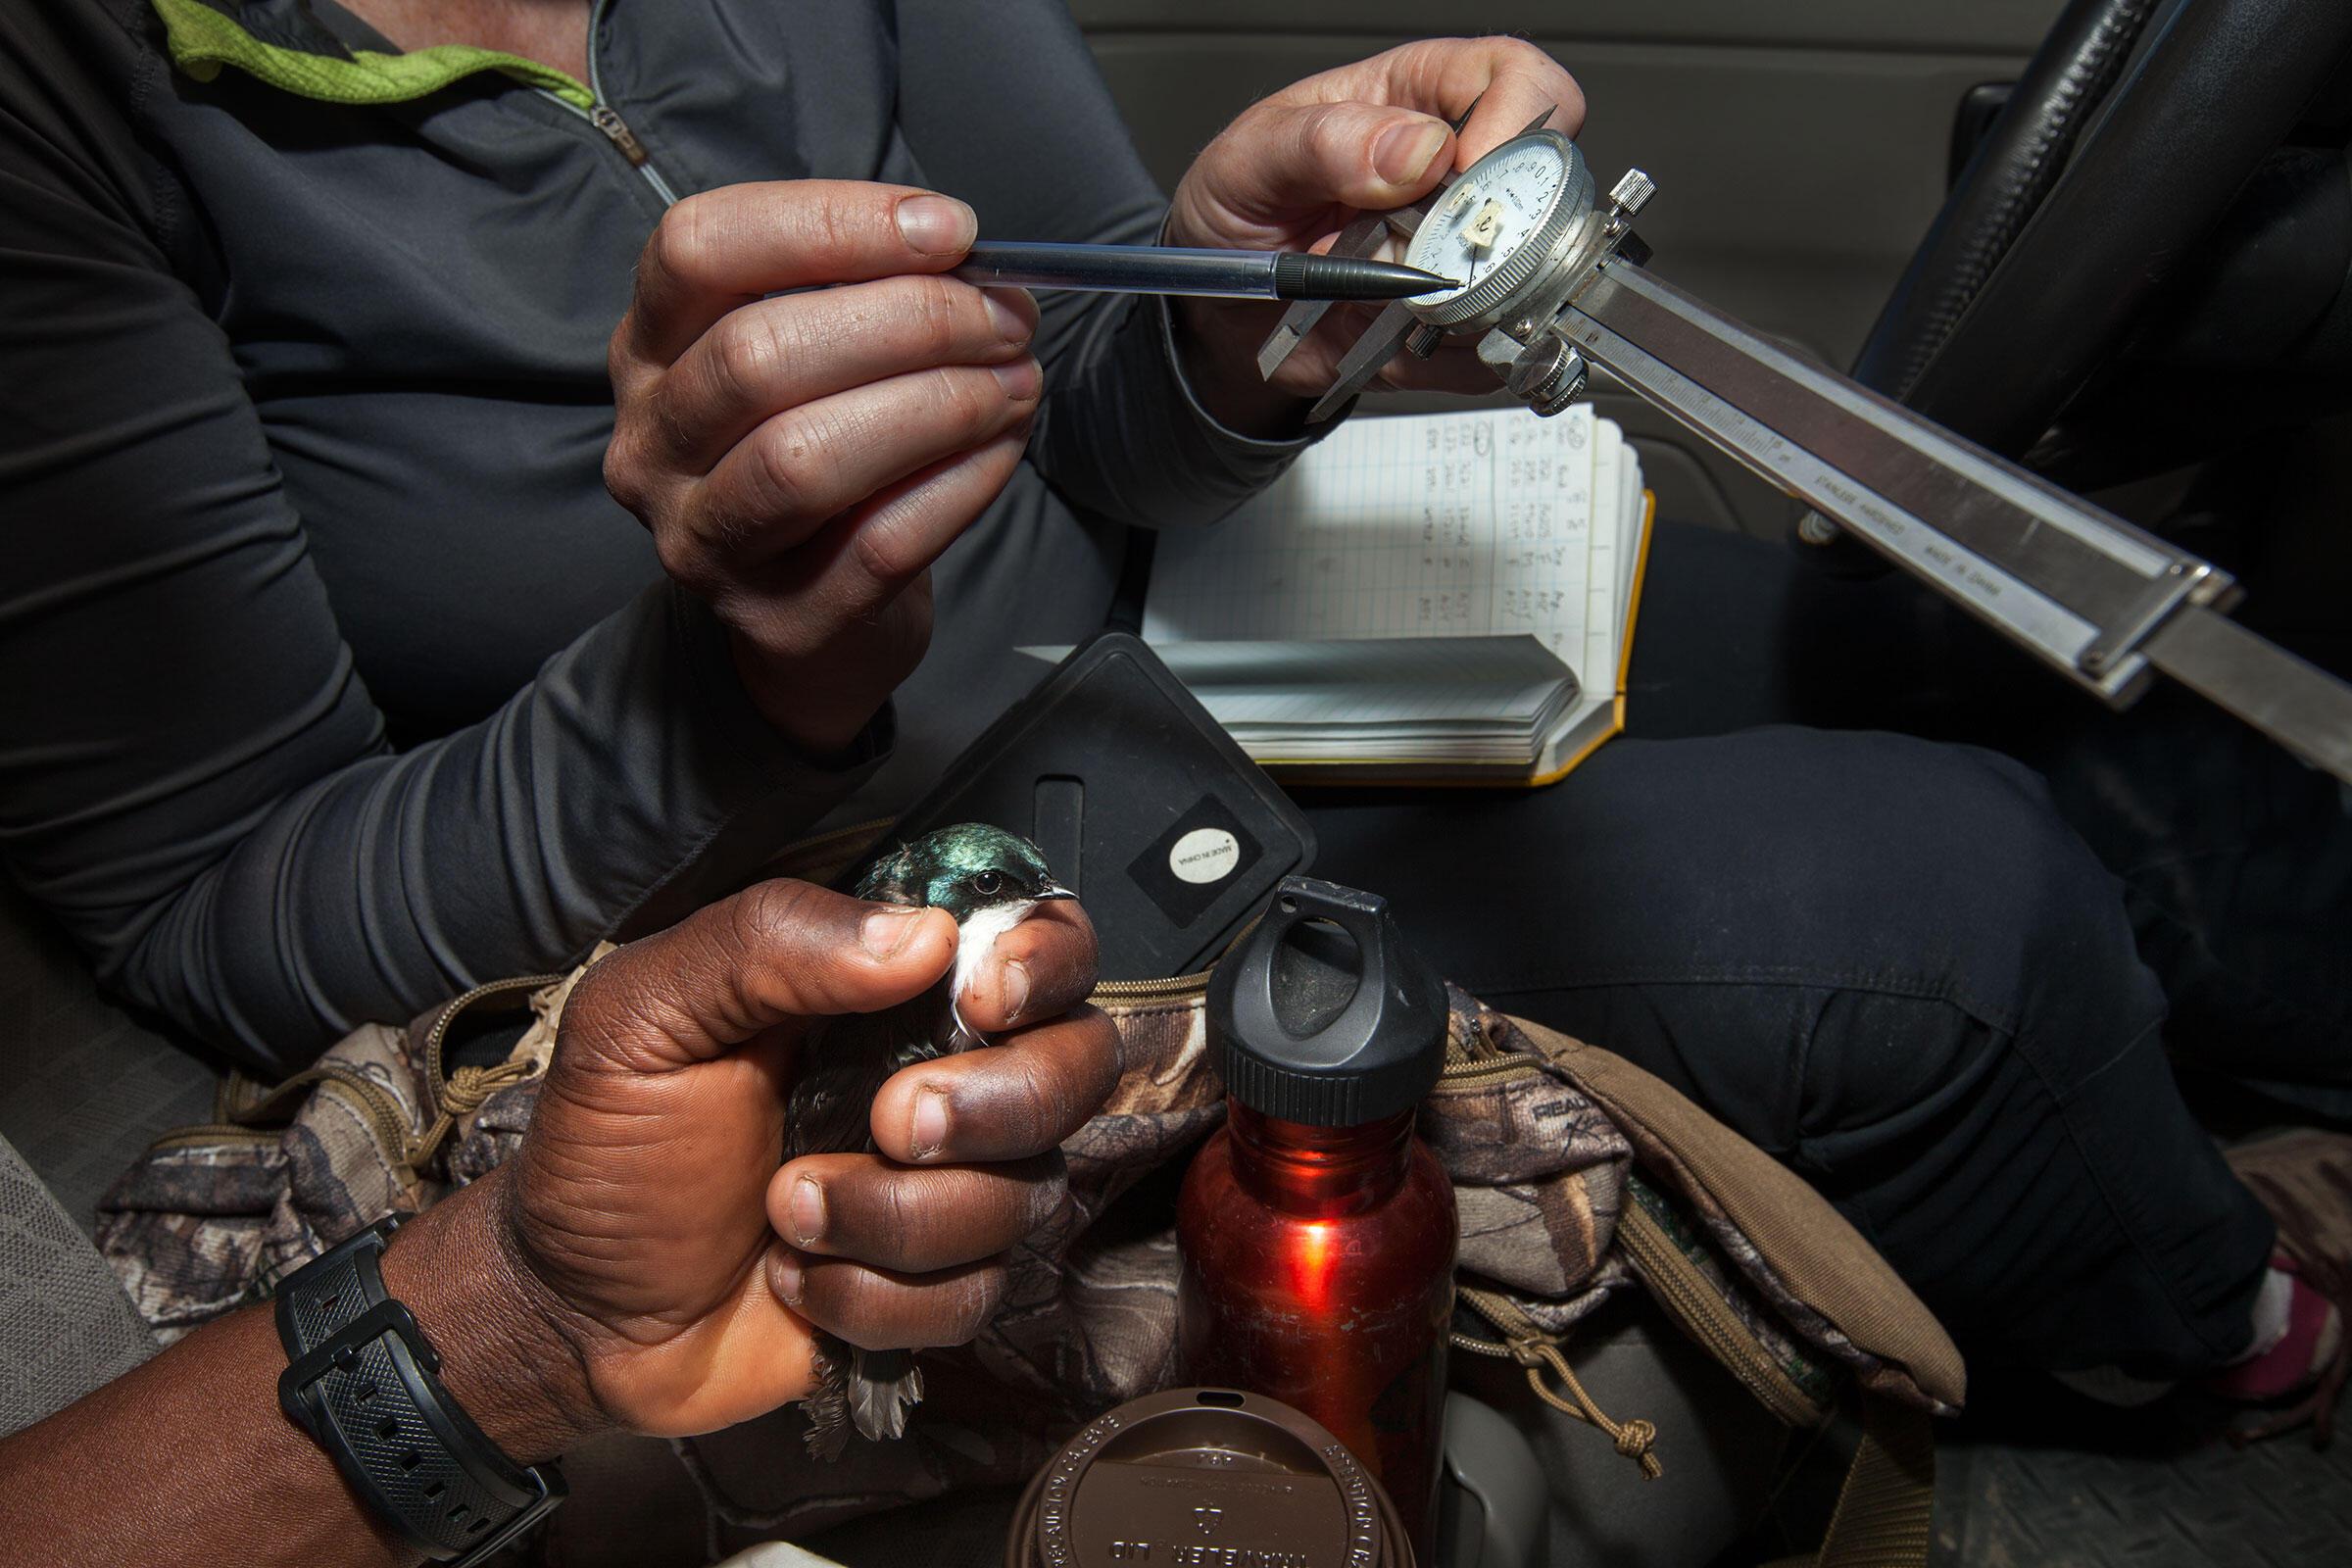 Morrissey teaches Bagonluri how to measure swallows using a caliper. Connor Stefanison